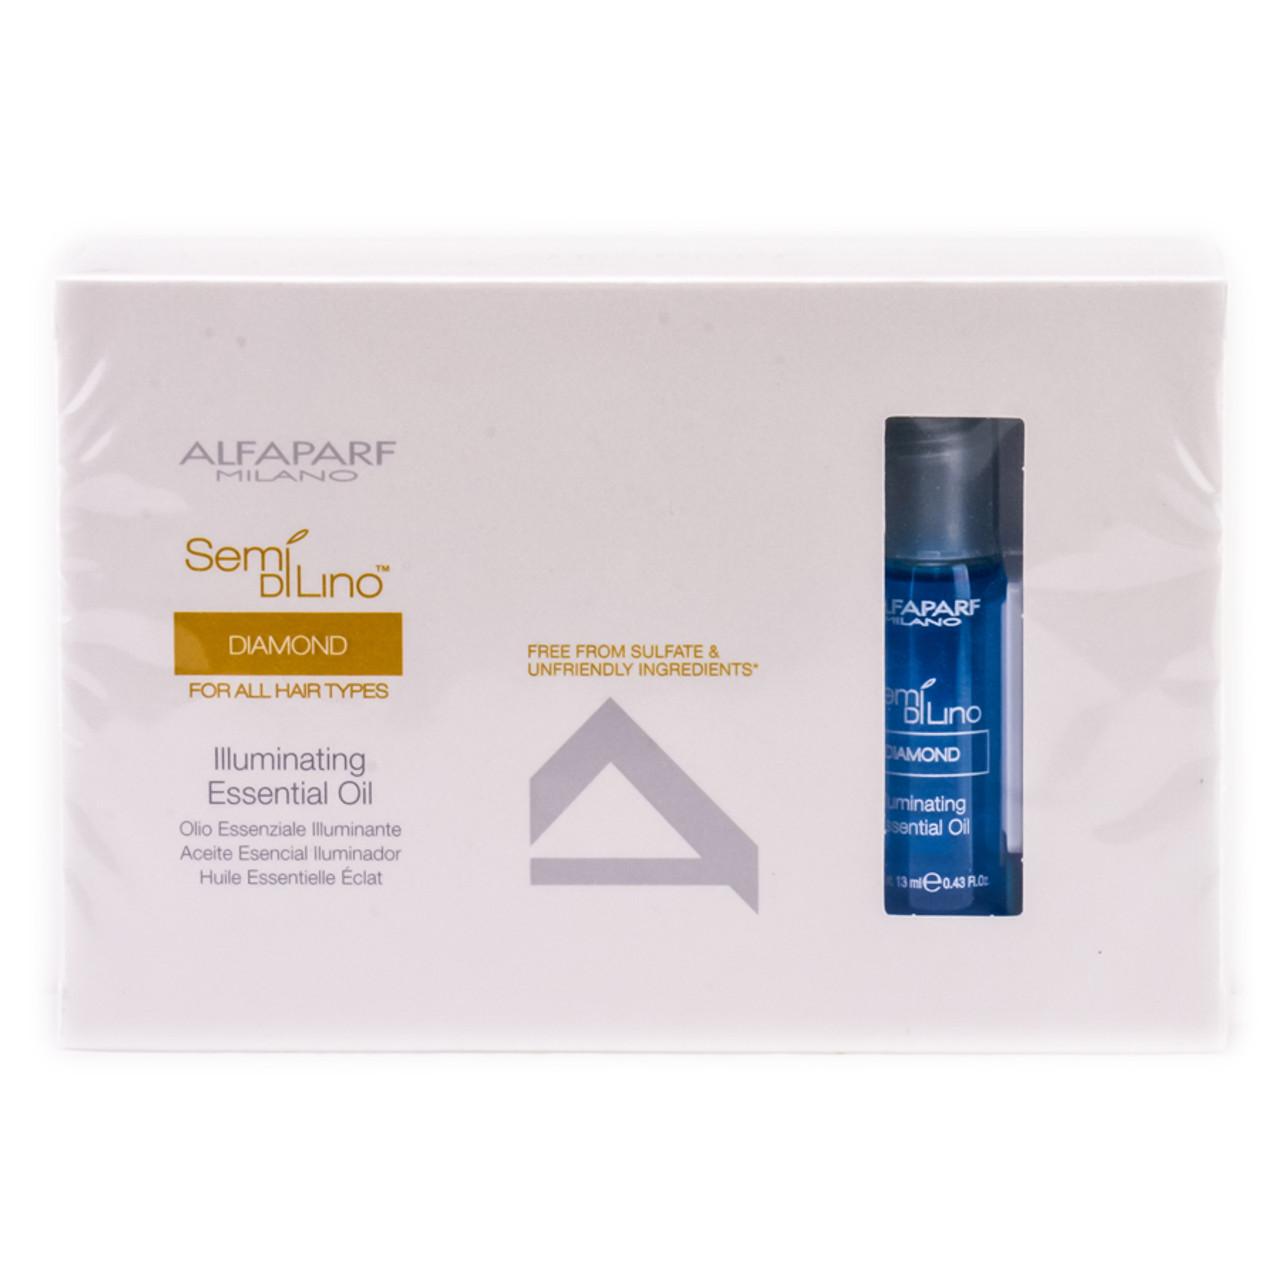 Alfaparf Semi Di Lino Diamond Illuminating Essential Oil Sleekshop